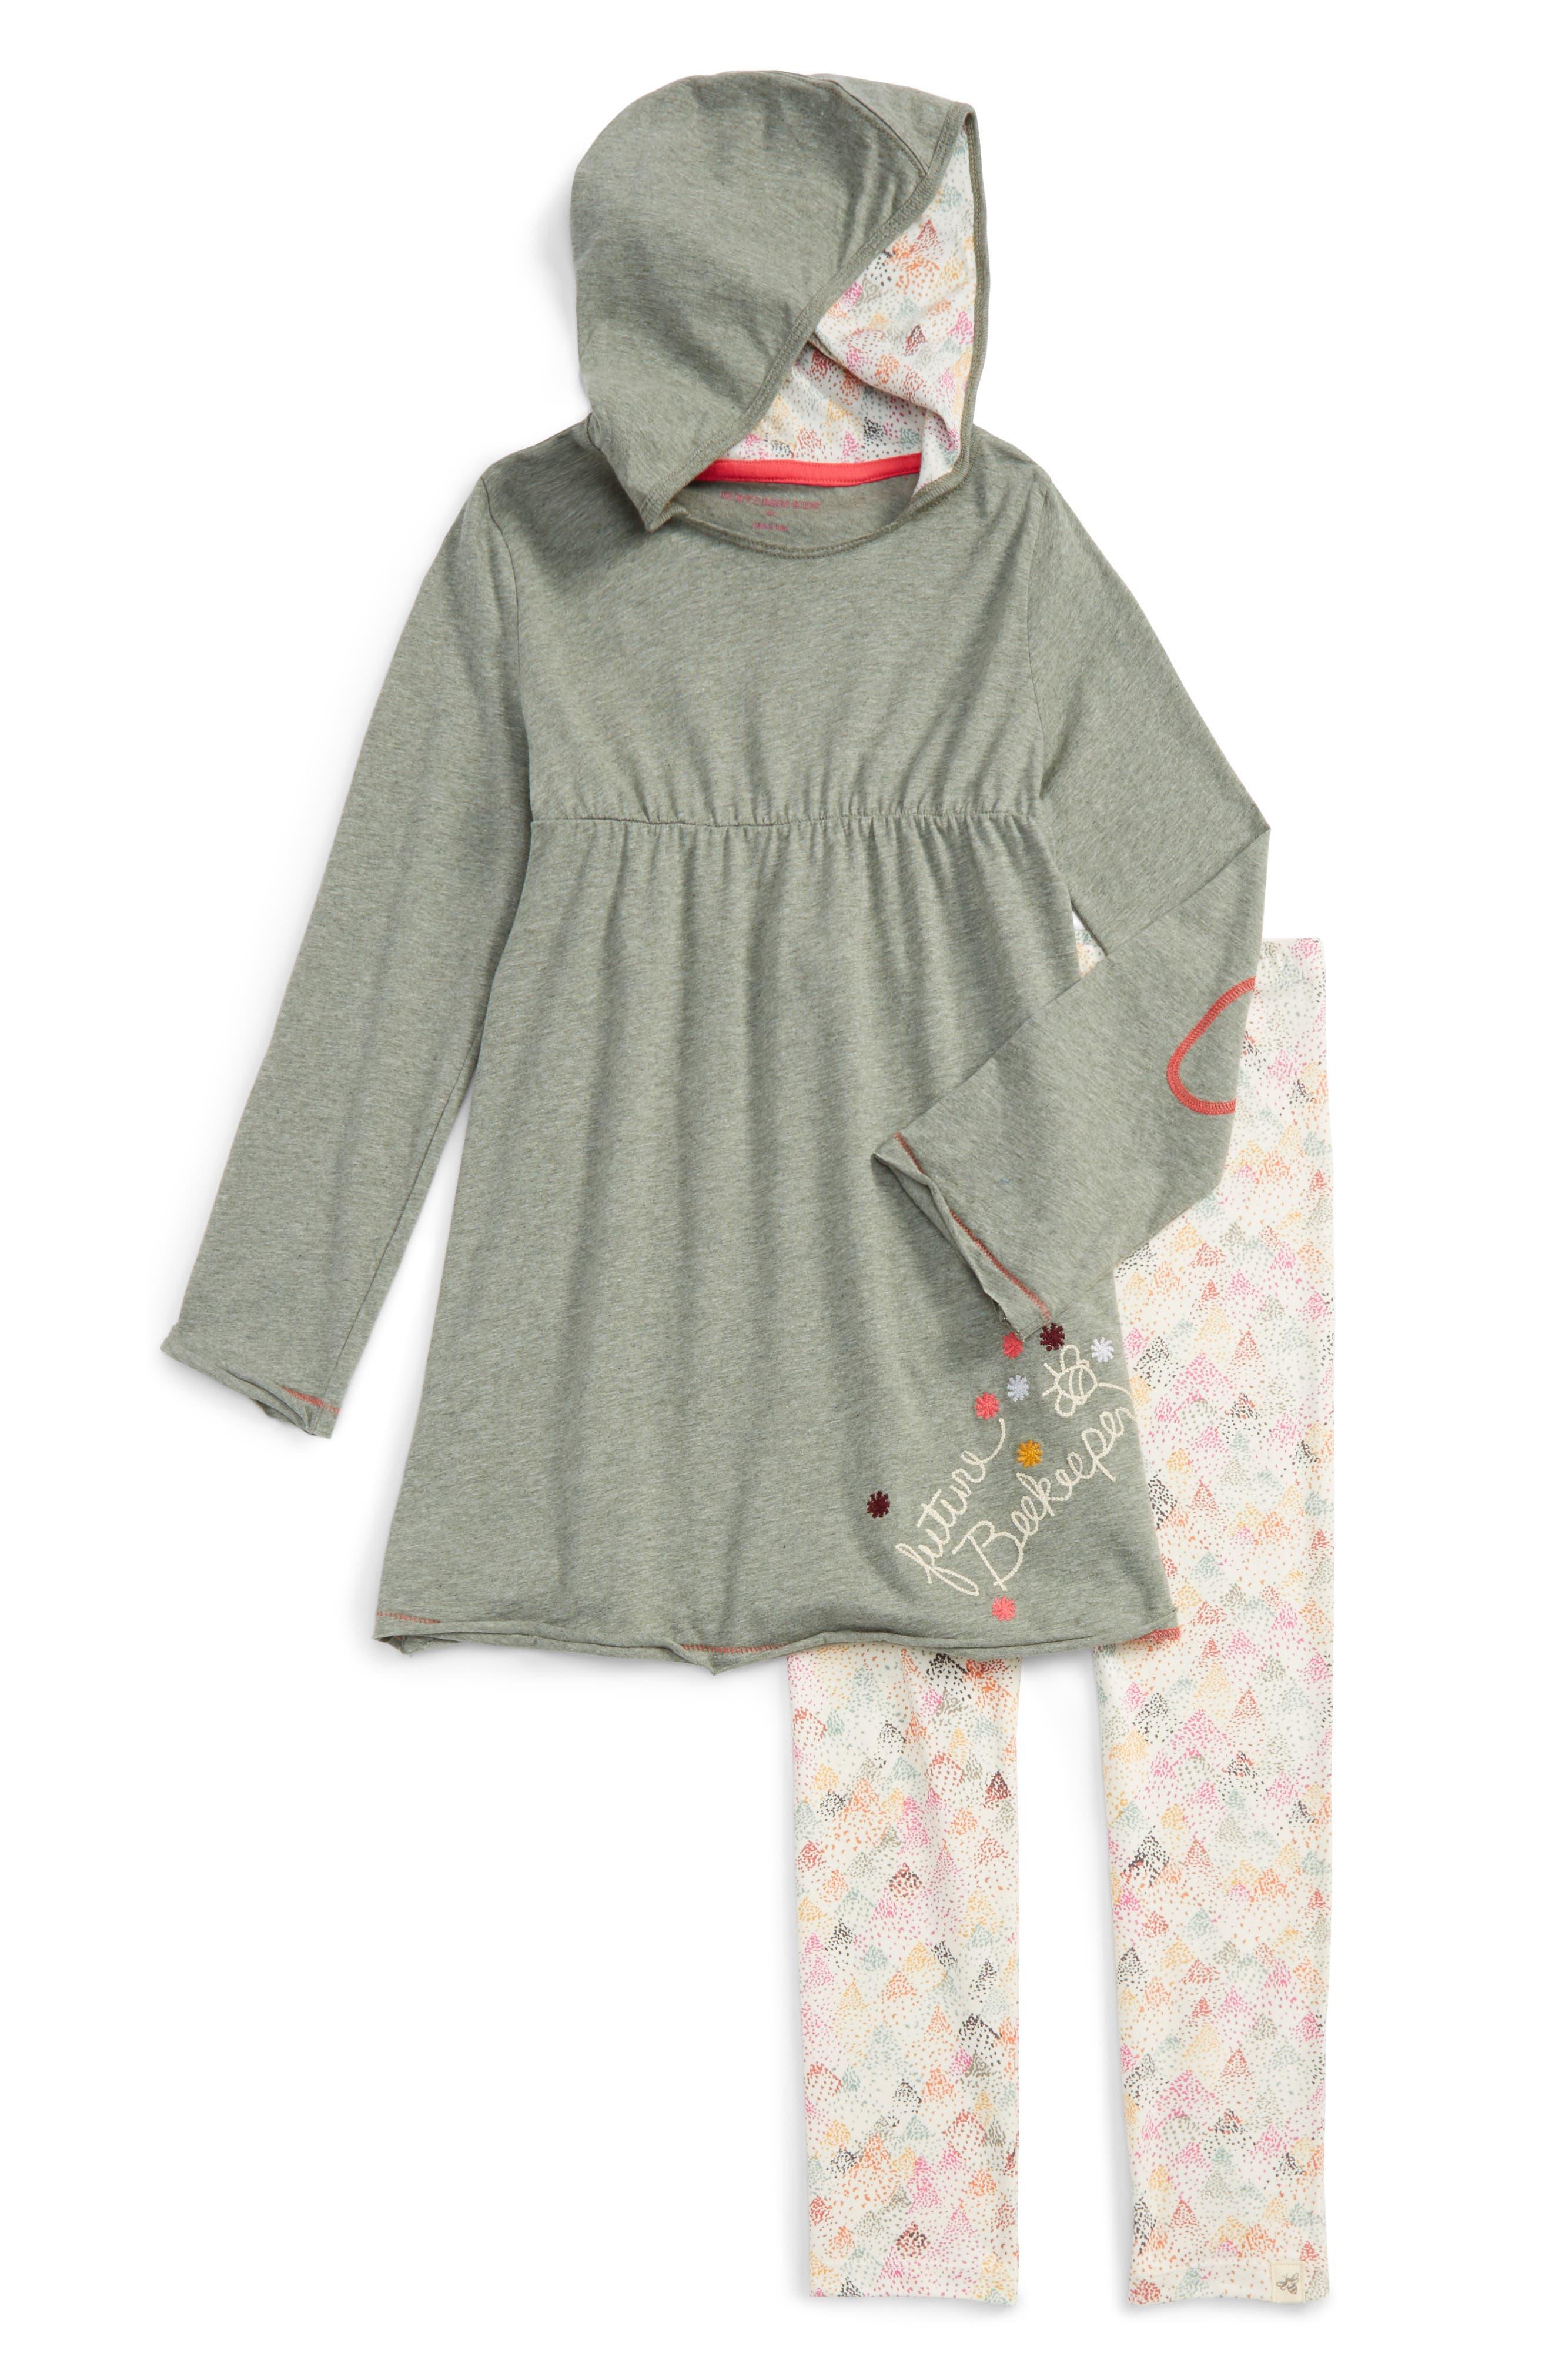 Burt's Bees Baby Organic Cotton Hooded Dress & Leggings Set (Toddler Girls & Little Girls)